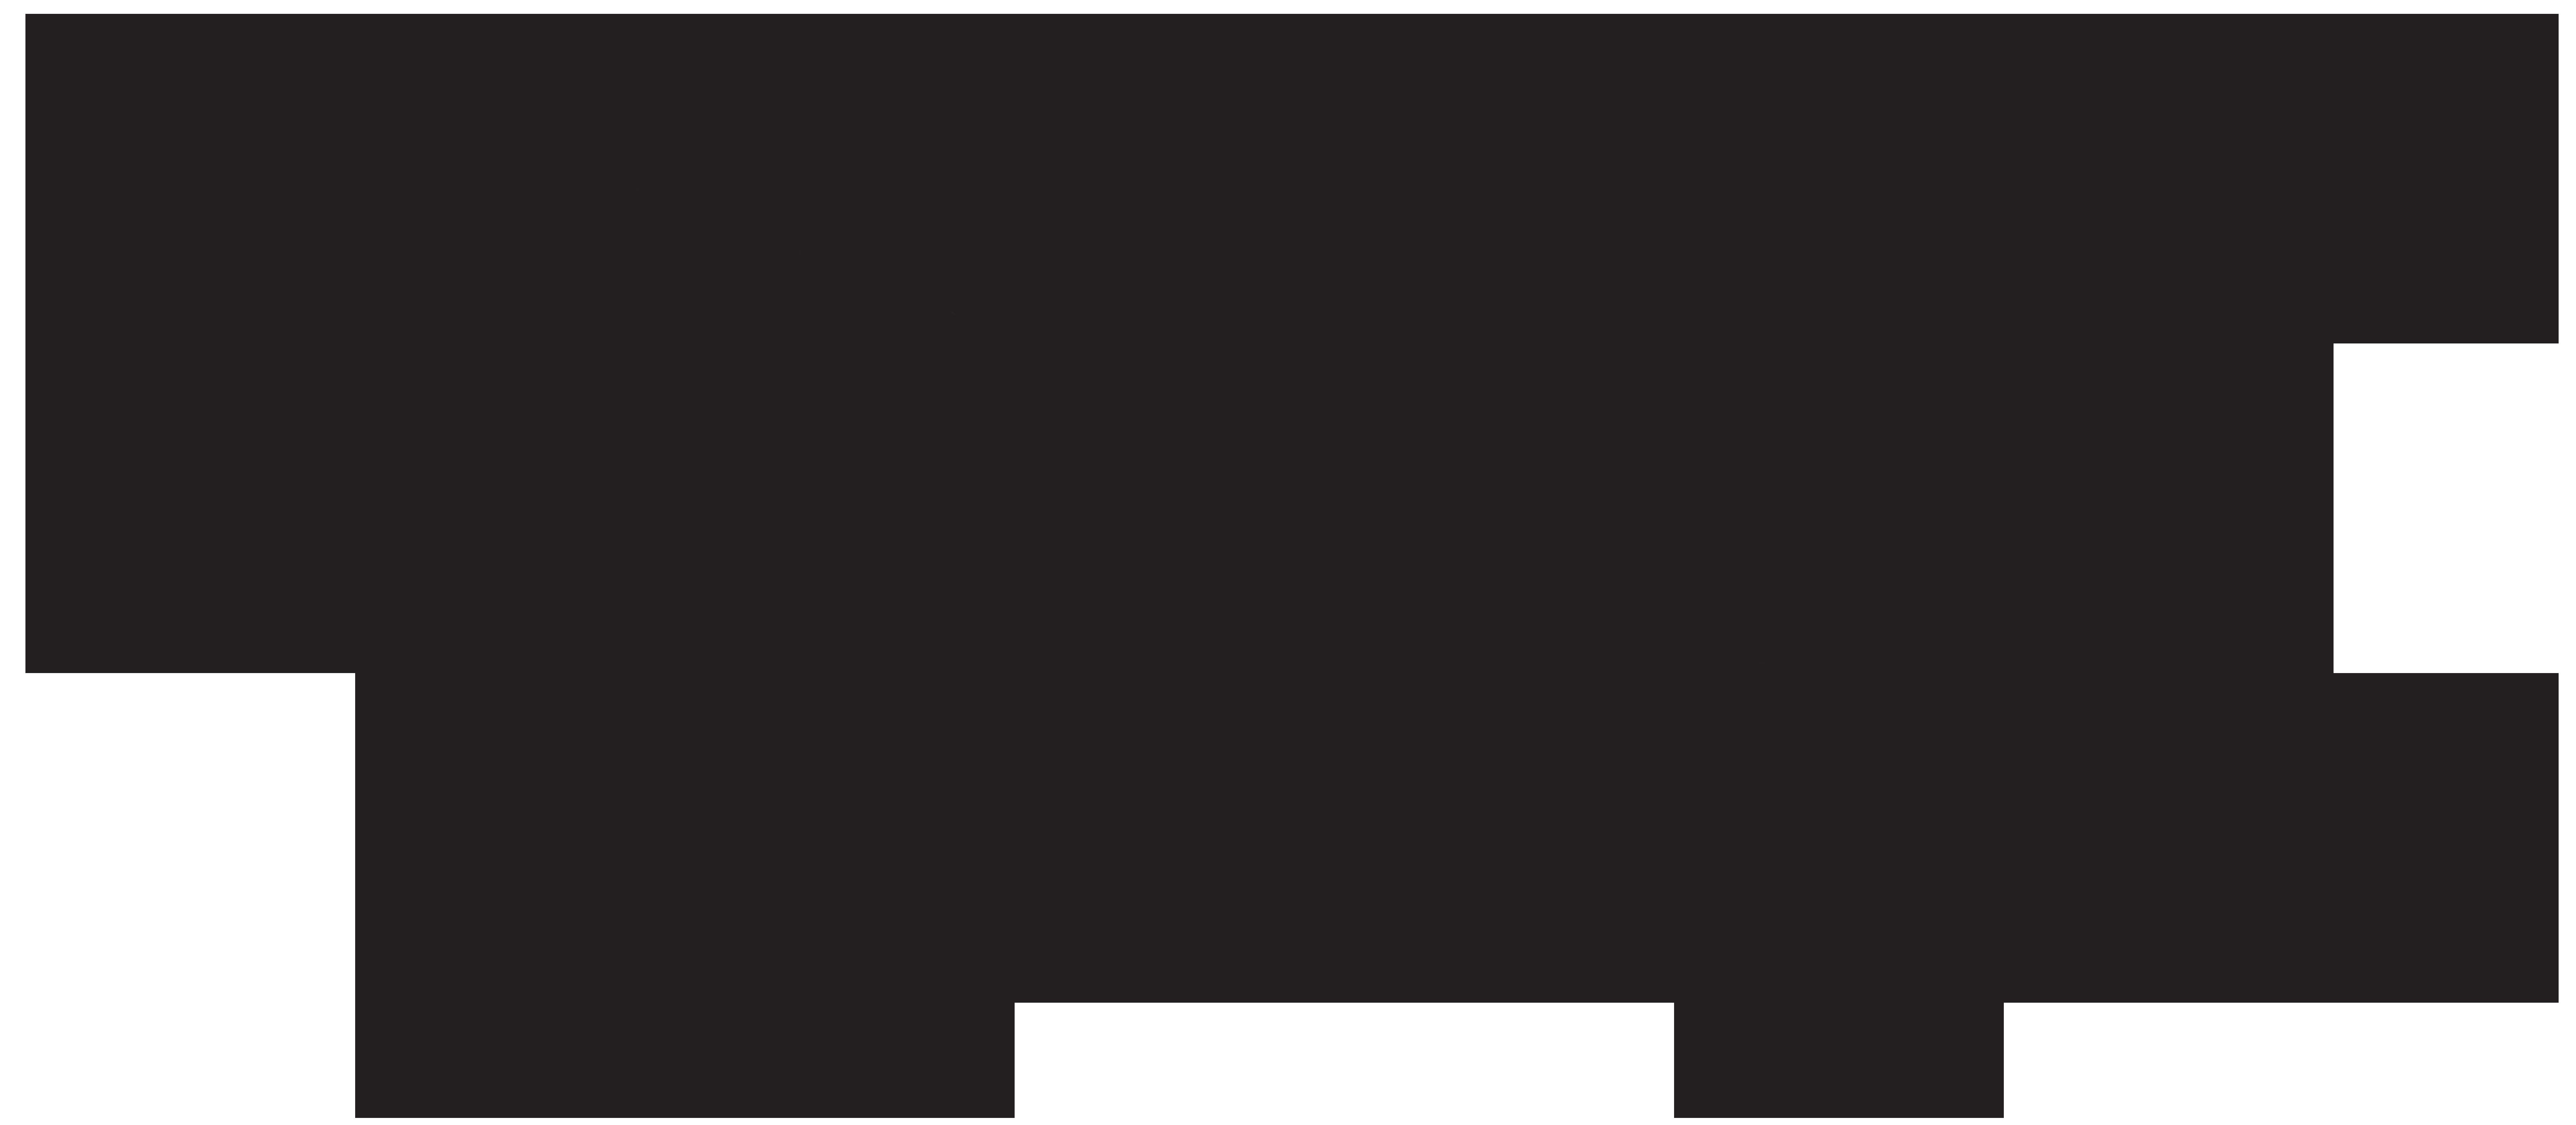 8000x3495 Plane Silhouette Png Clip Artu200b Gallery Yopriceville